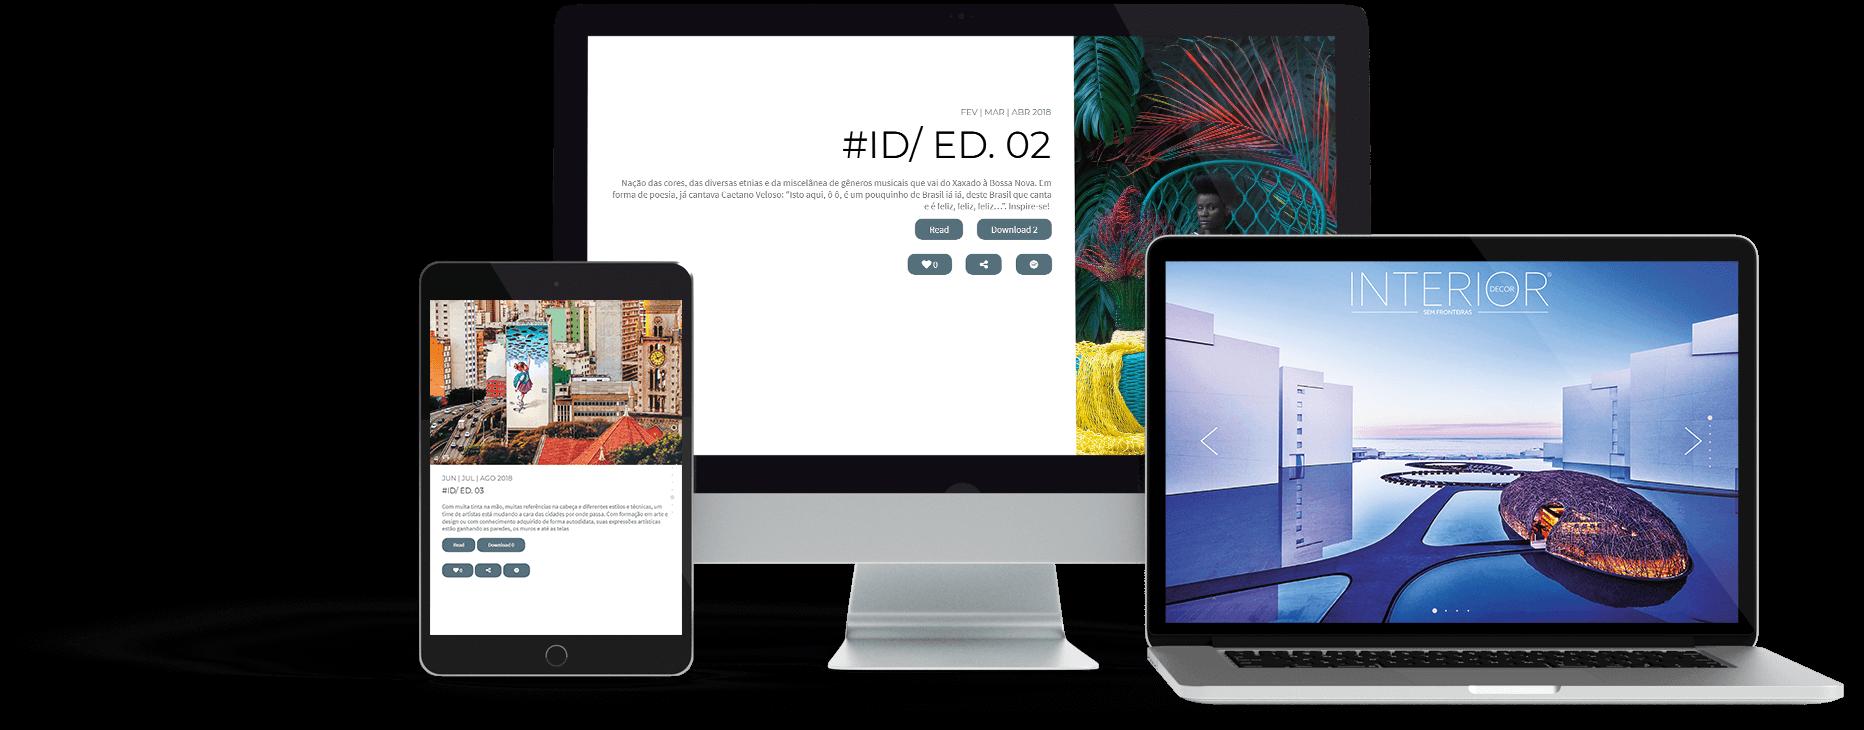 Website da empresa Interior